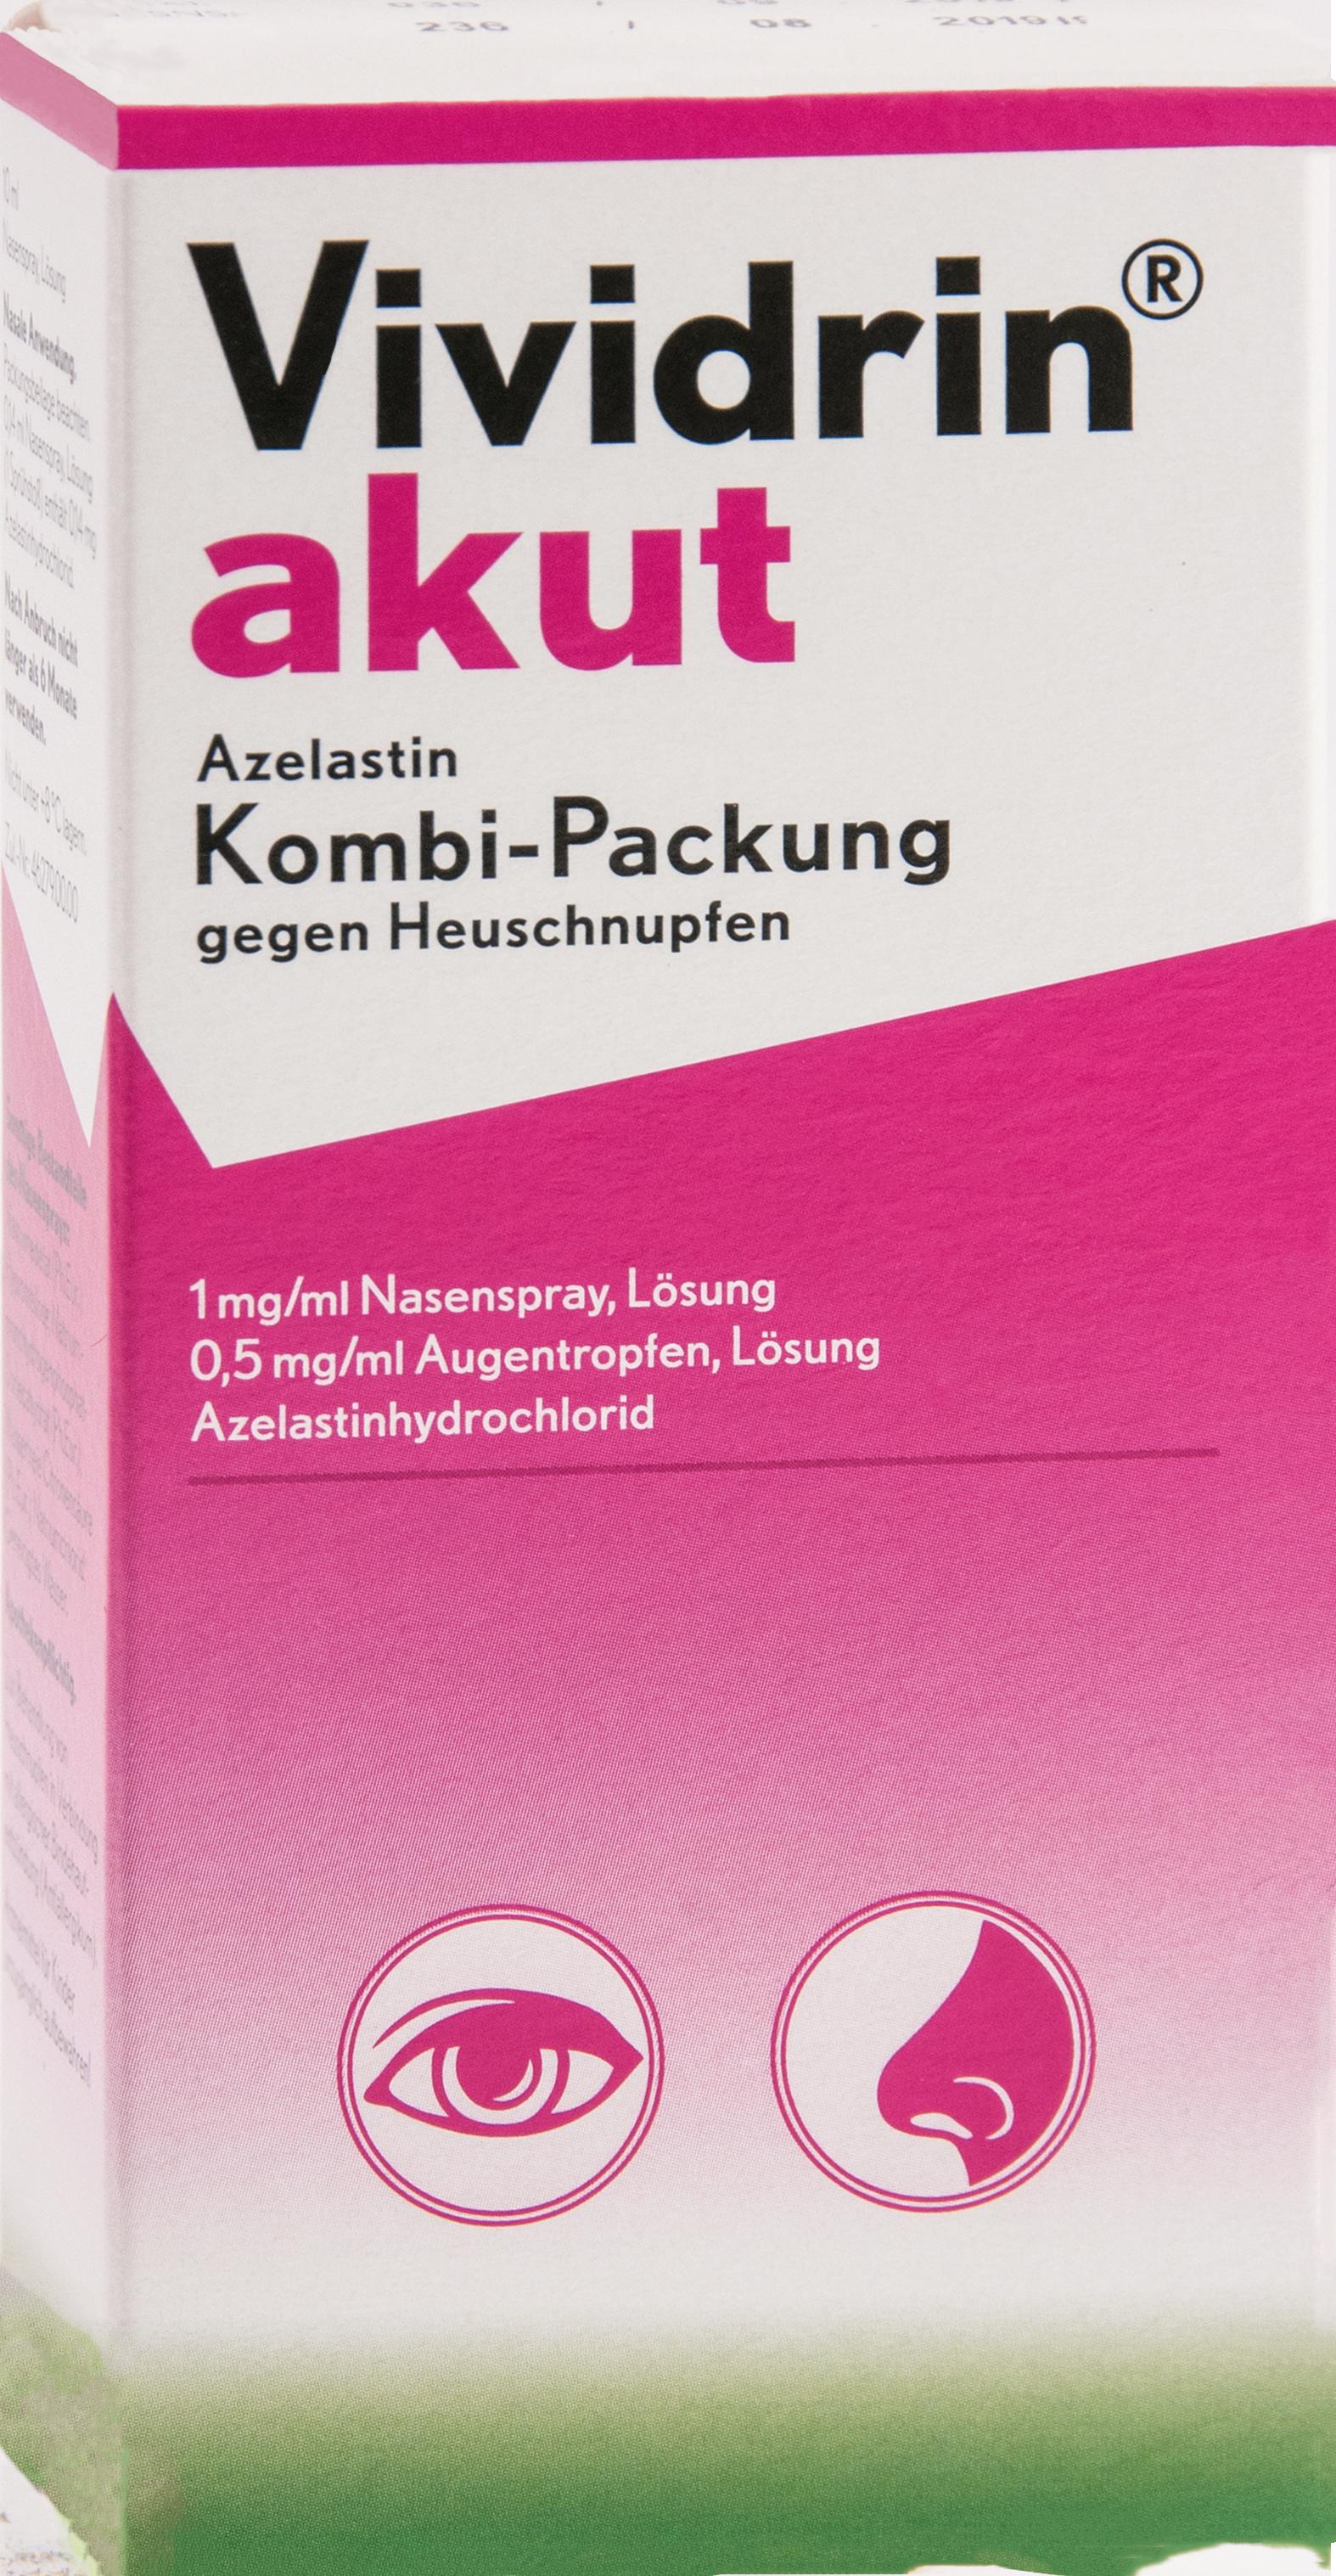 Vividrin akut Azelastin 4mlAT/10mlNaSpr geg.Heusch